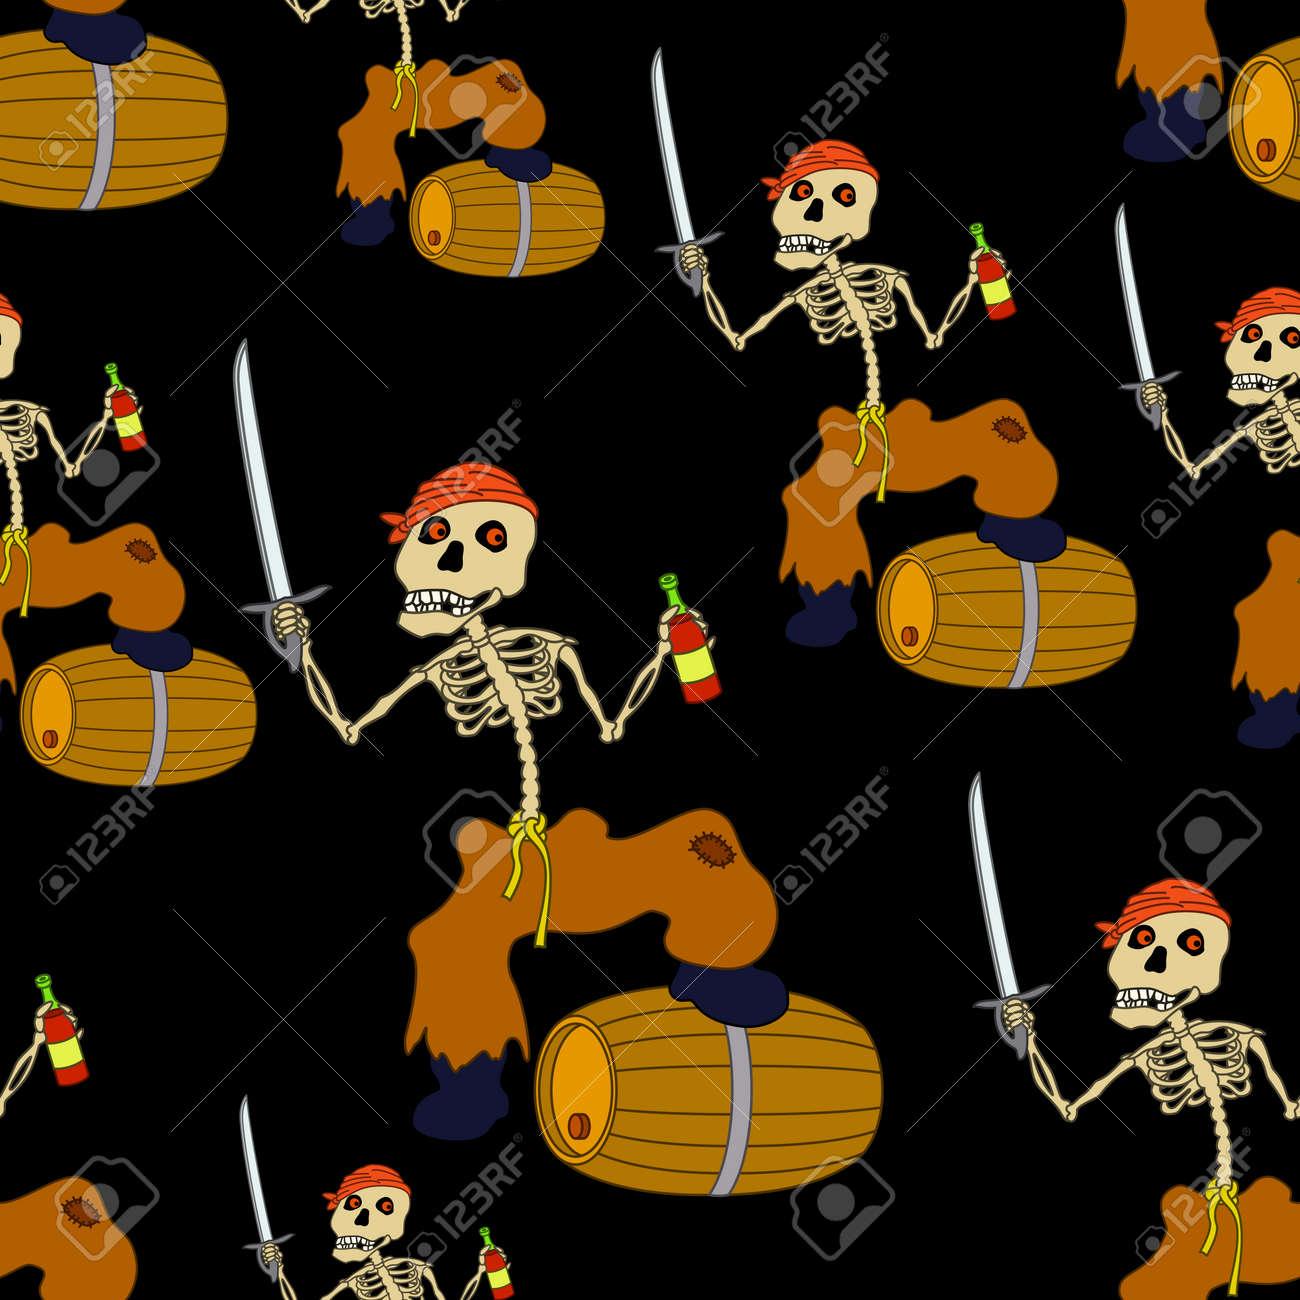 Christmas Zombie Wallpaper.Seamless Wallpaper Cartoon Evil Zombie Pirate Jolly Roger Skeleton